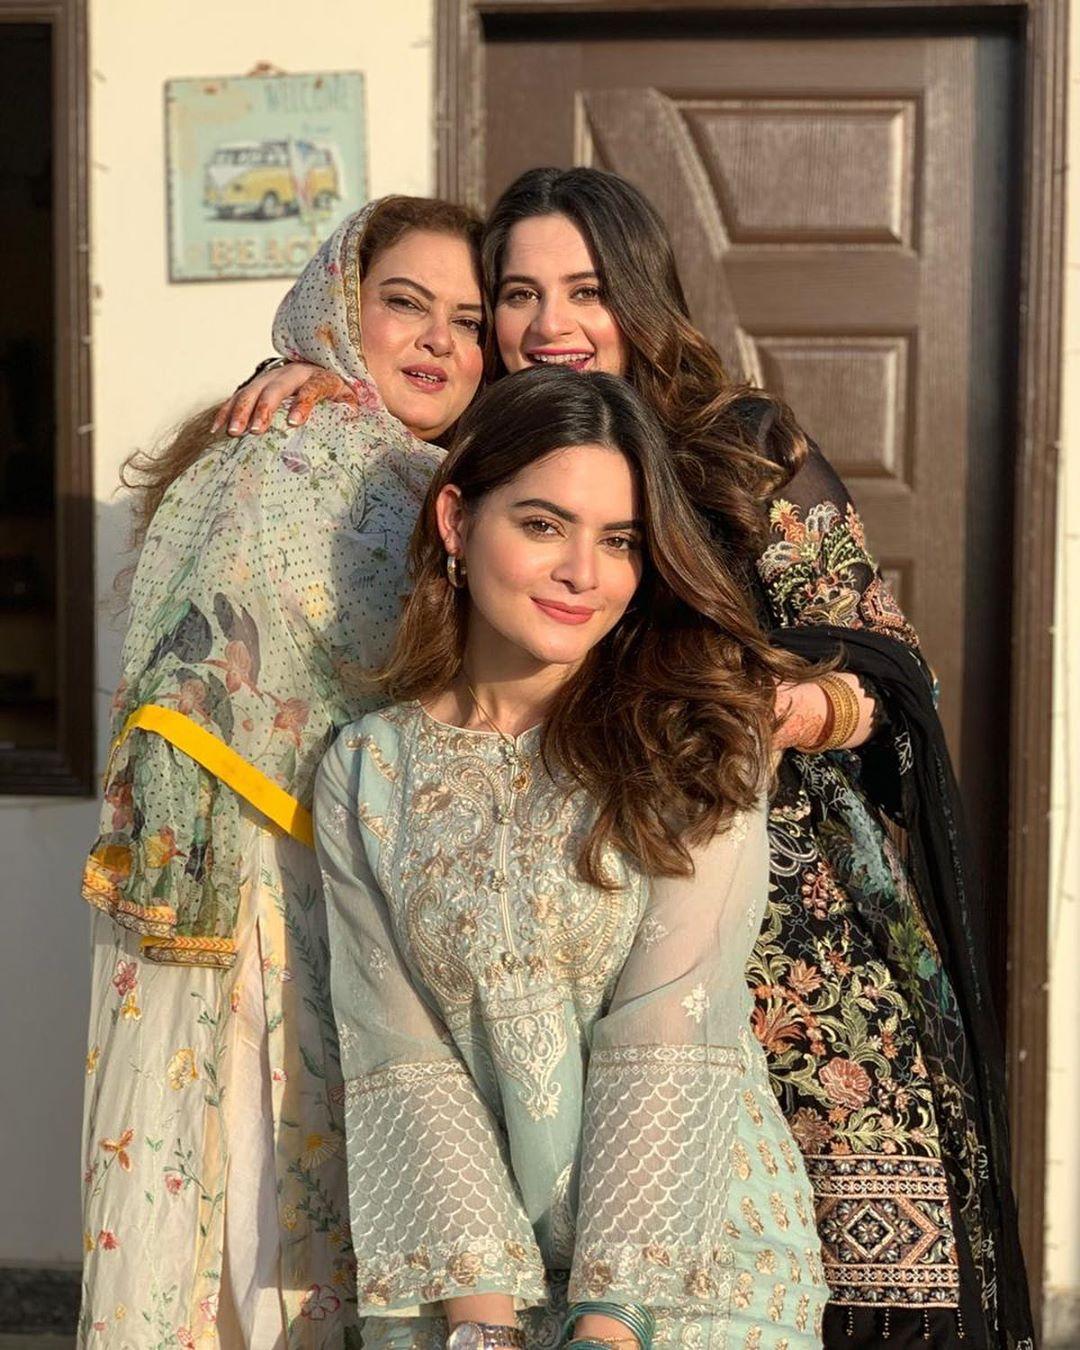 Aiman Khan and Minal Khan Celebrating their Mother's Birthday